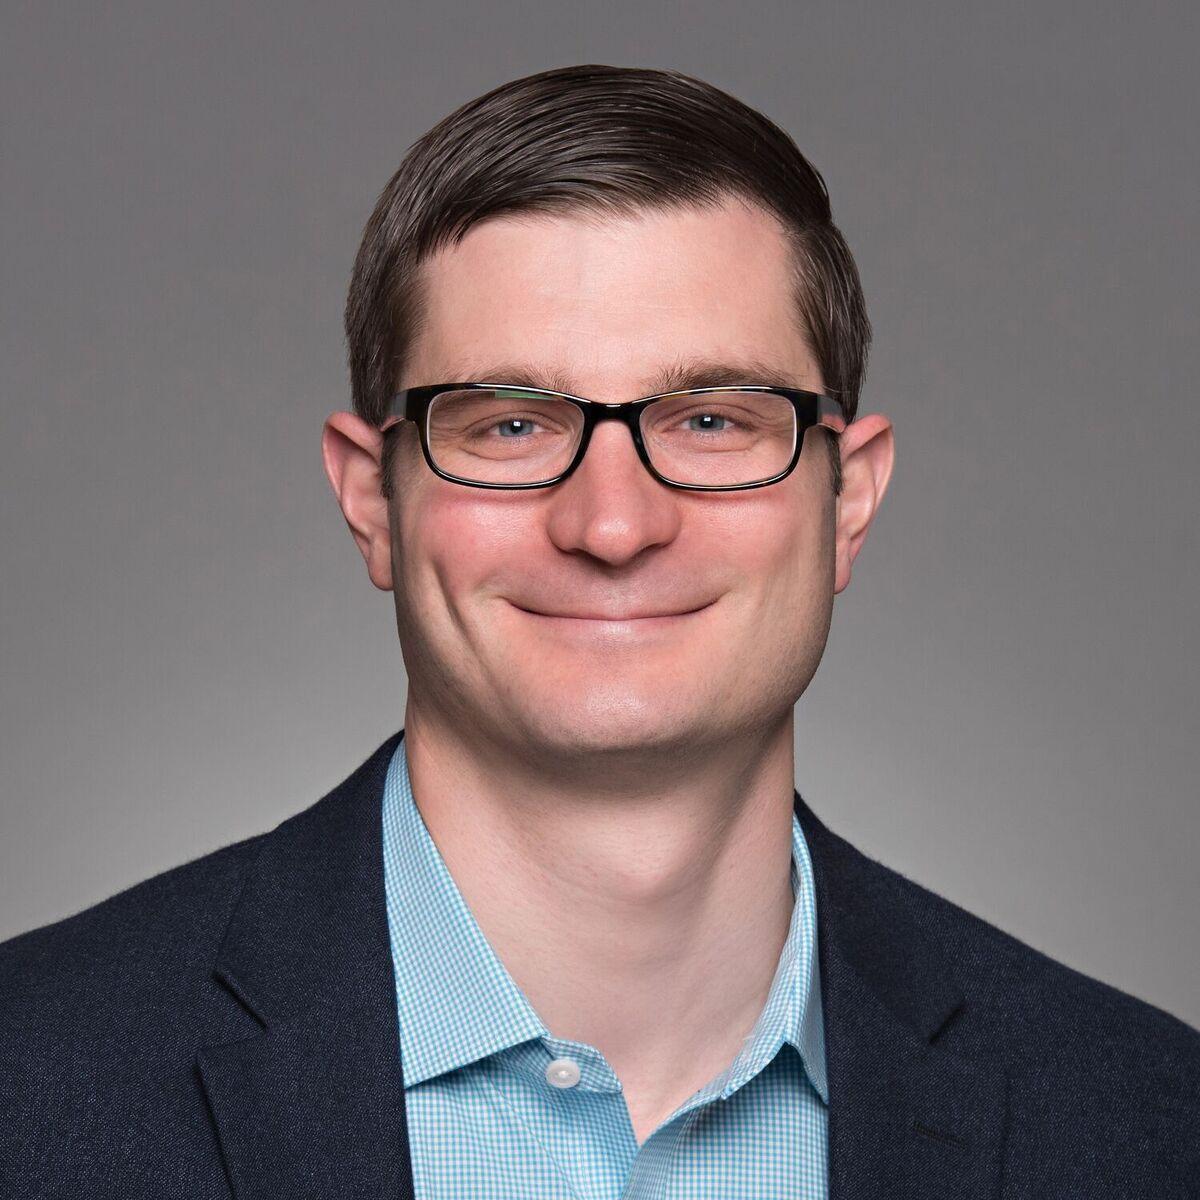 Chip Johnson, a principal at Falfurrias Capital Partners